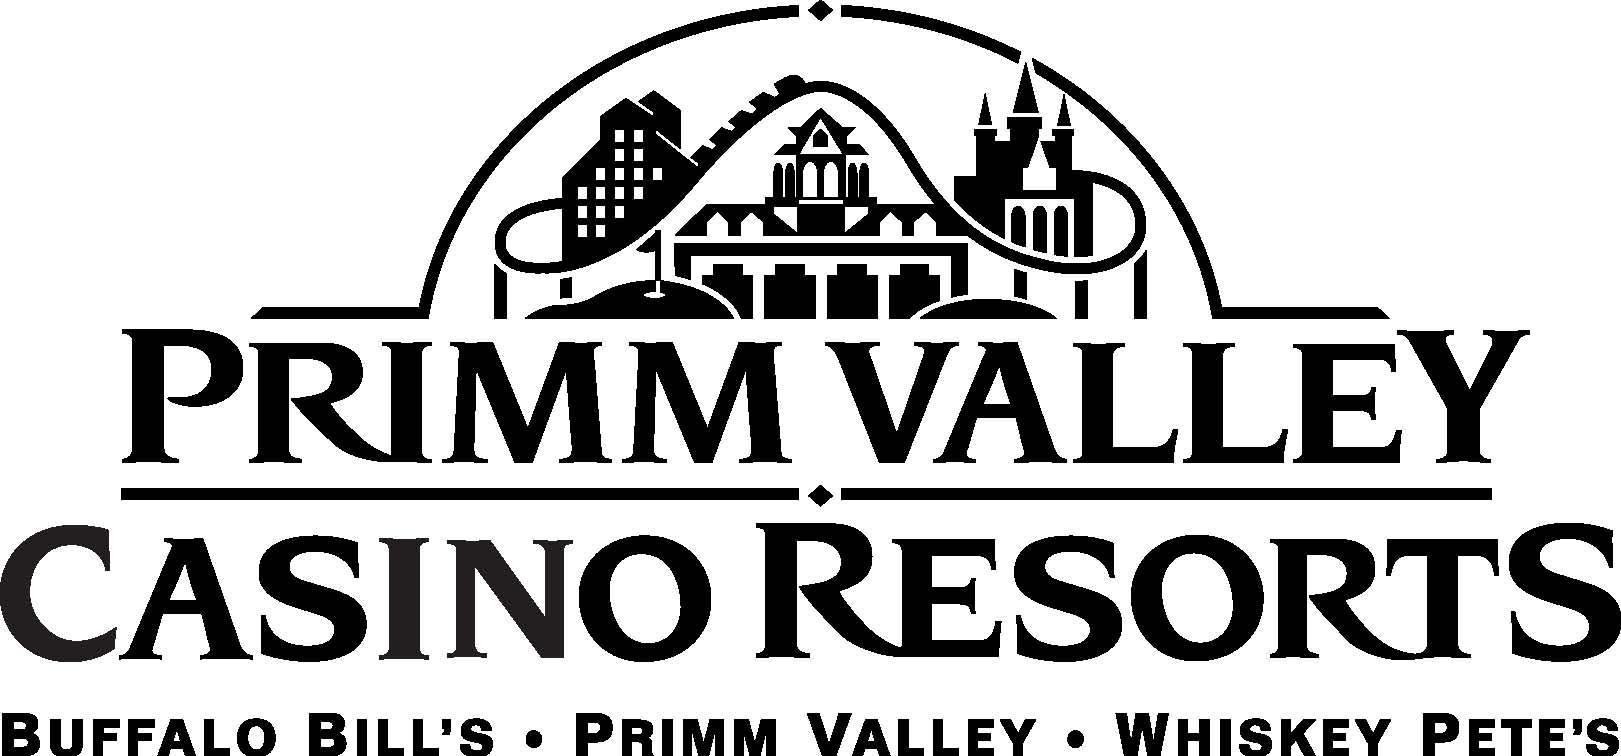 Primm Valley Casino logo.jpg